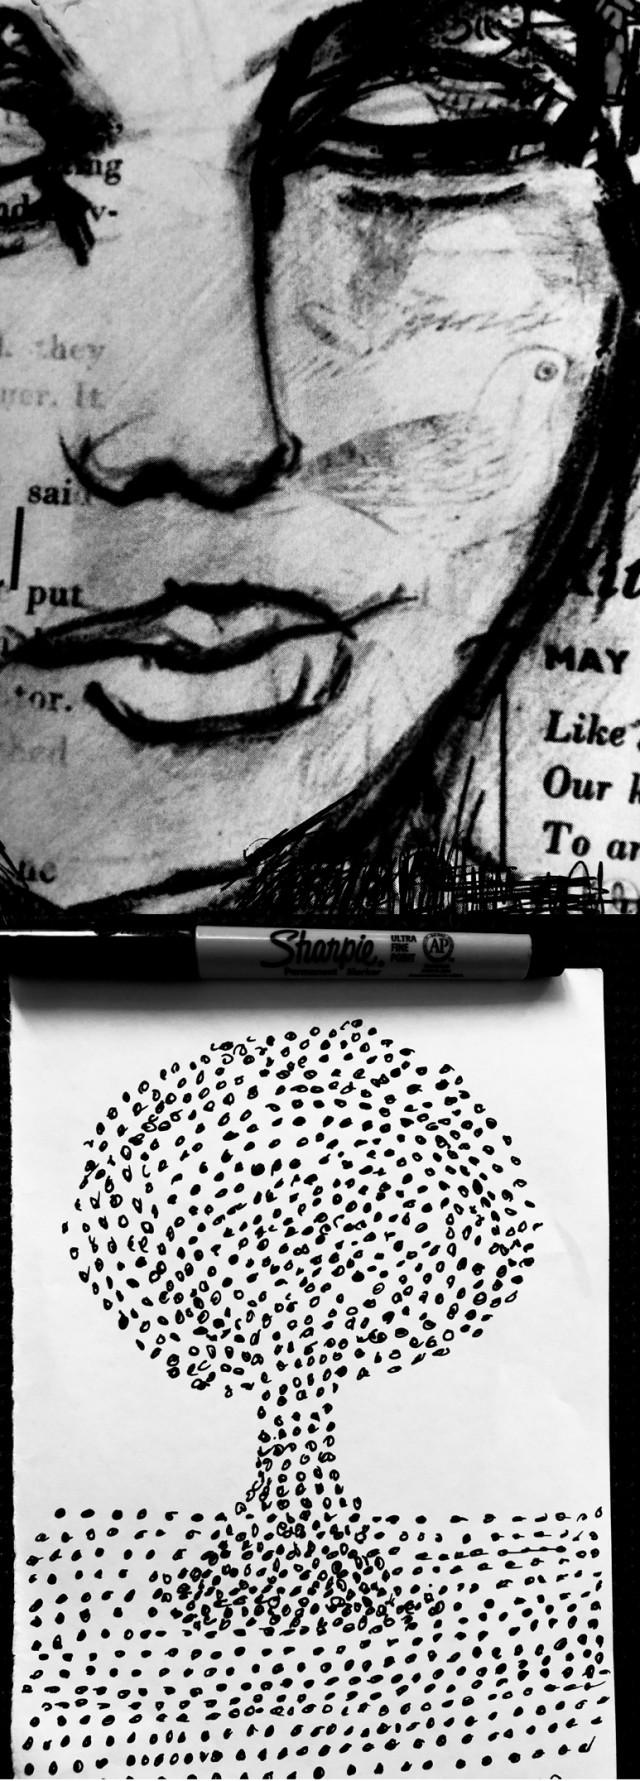 INKD0022